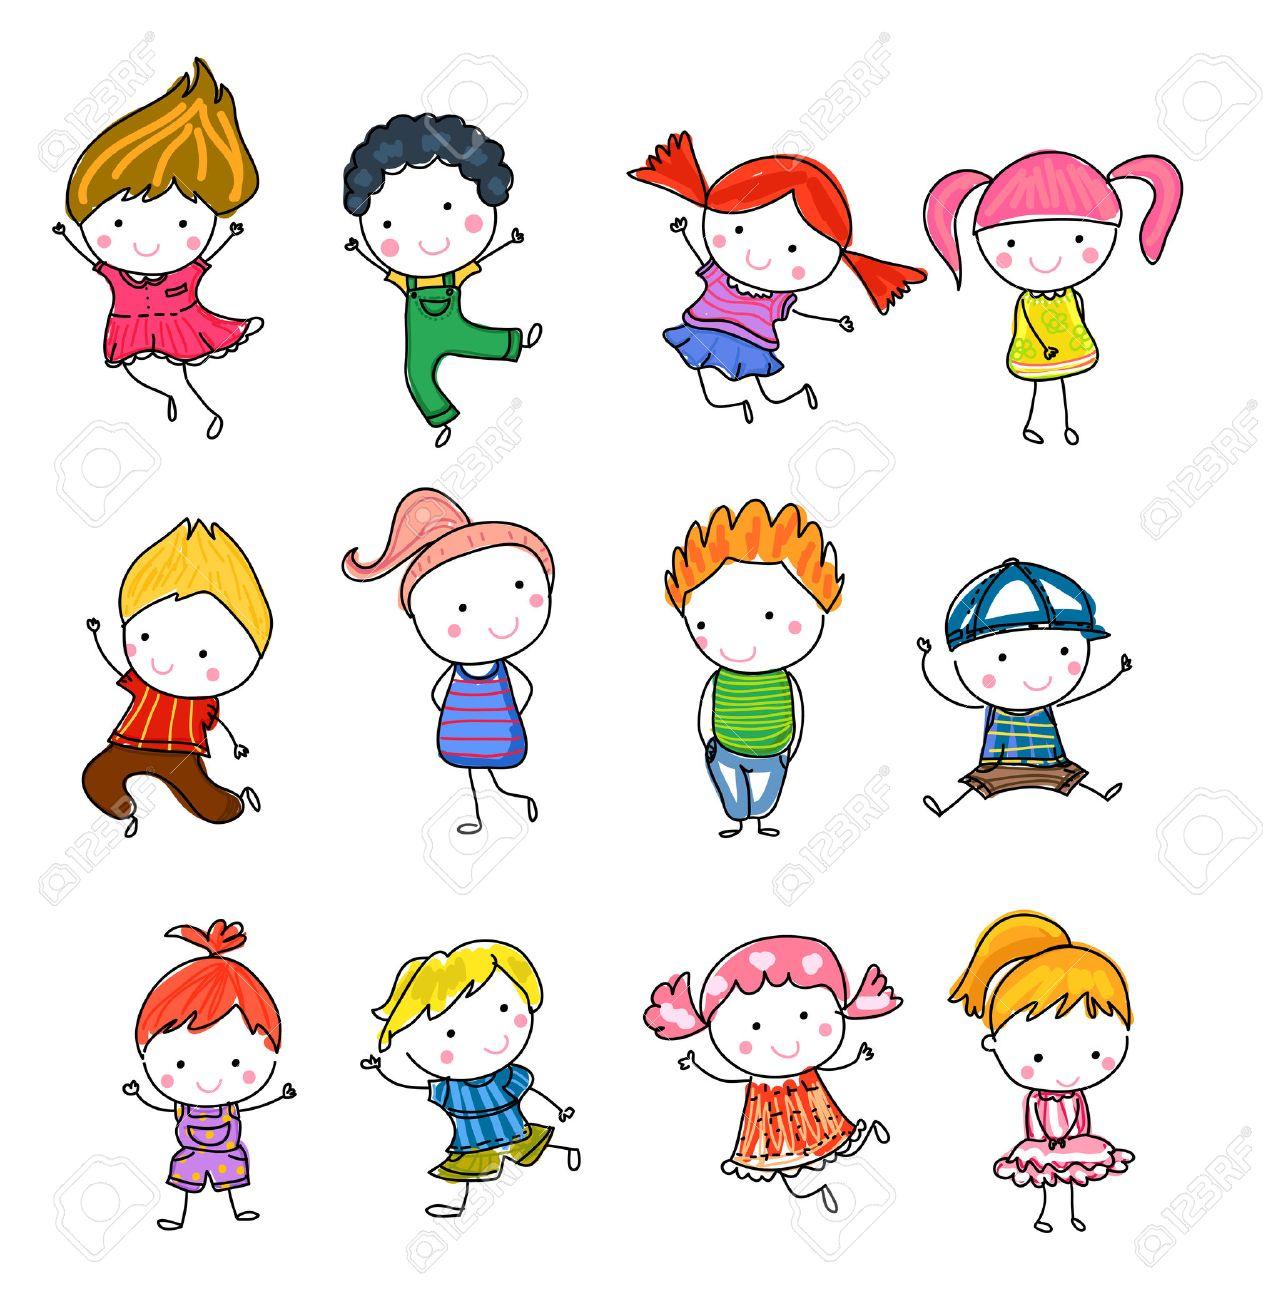 Group of kids, drawing sketch - 52394560